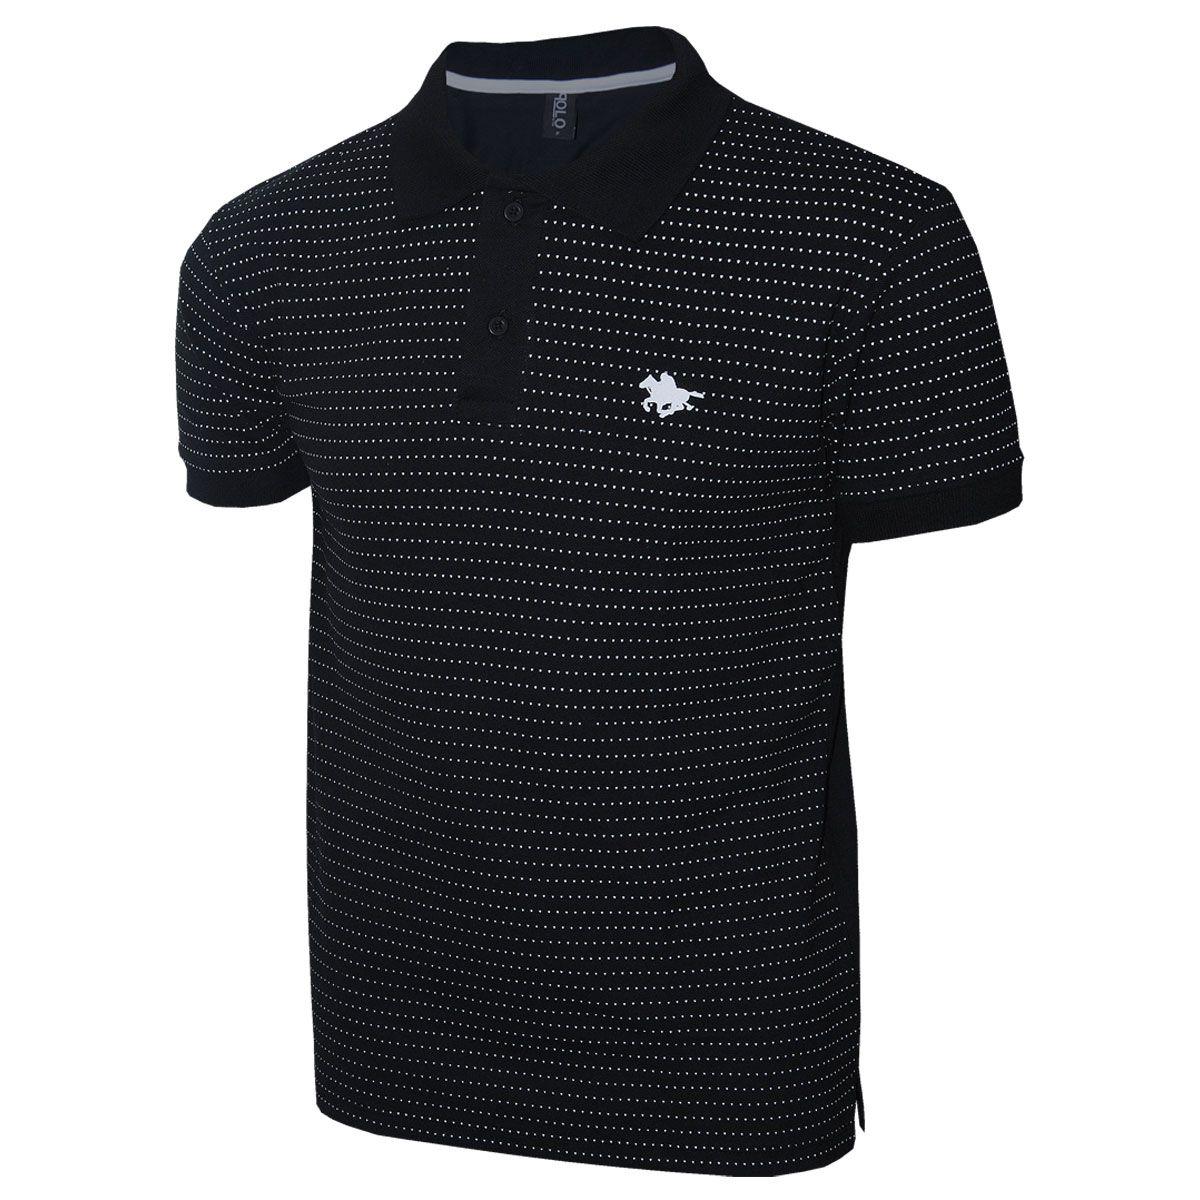 Camisa Polo RG518 com Estampa Mini Print